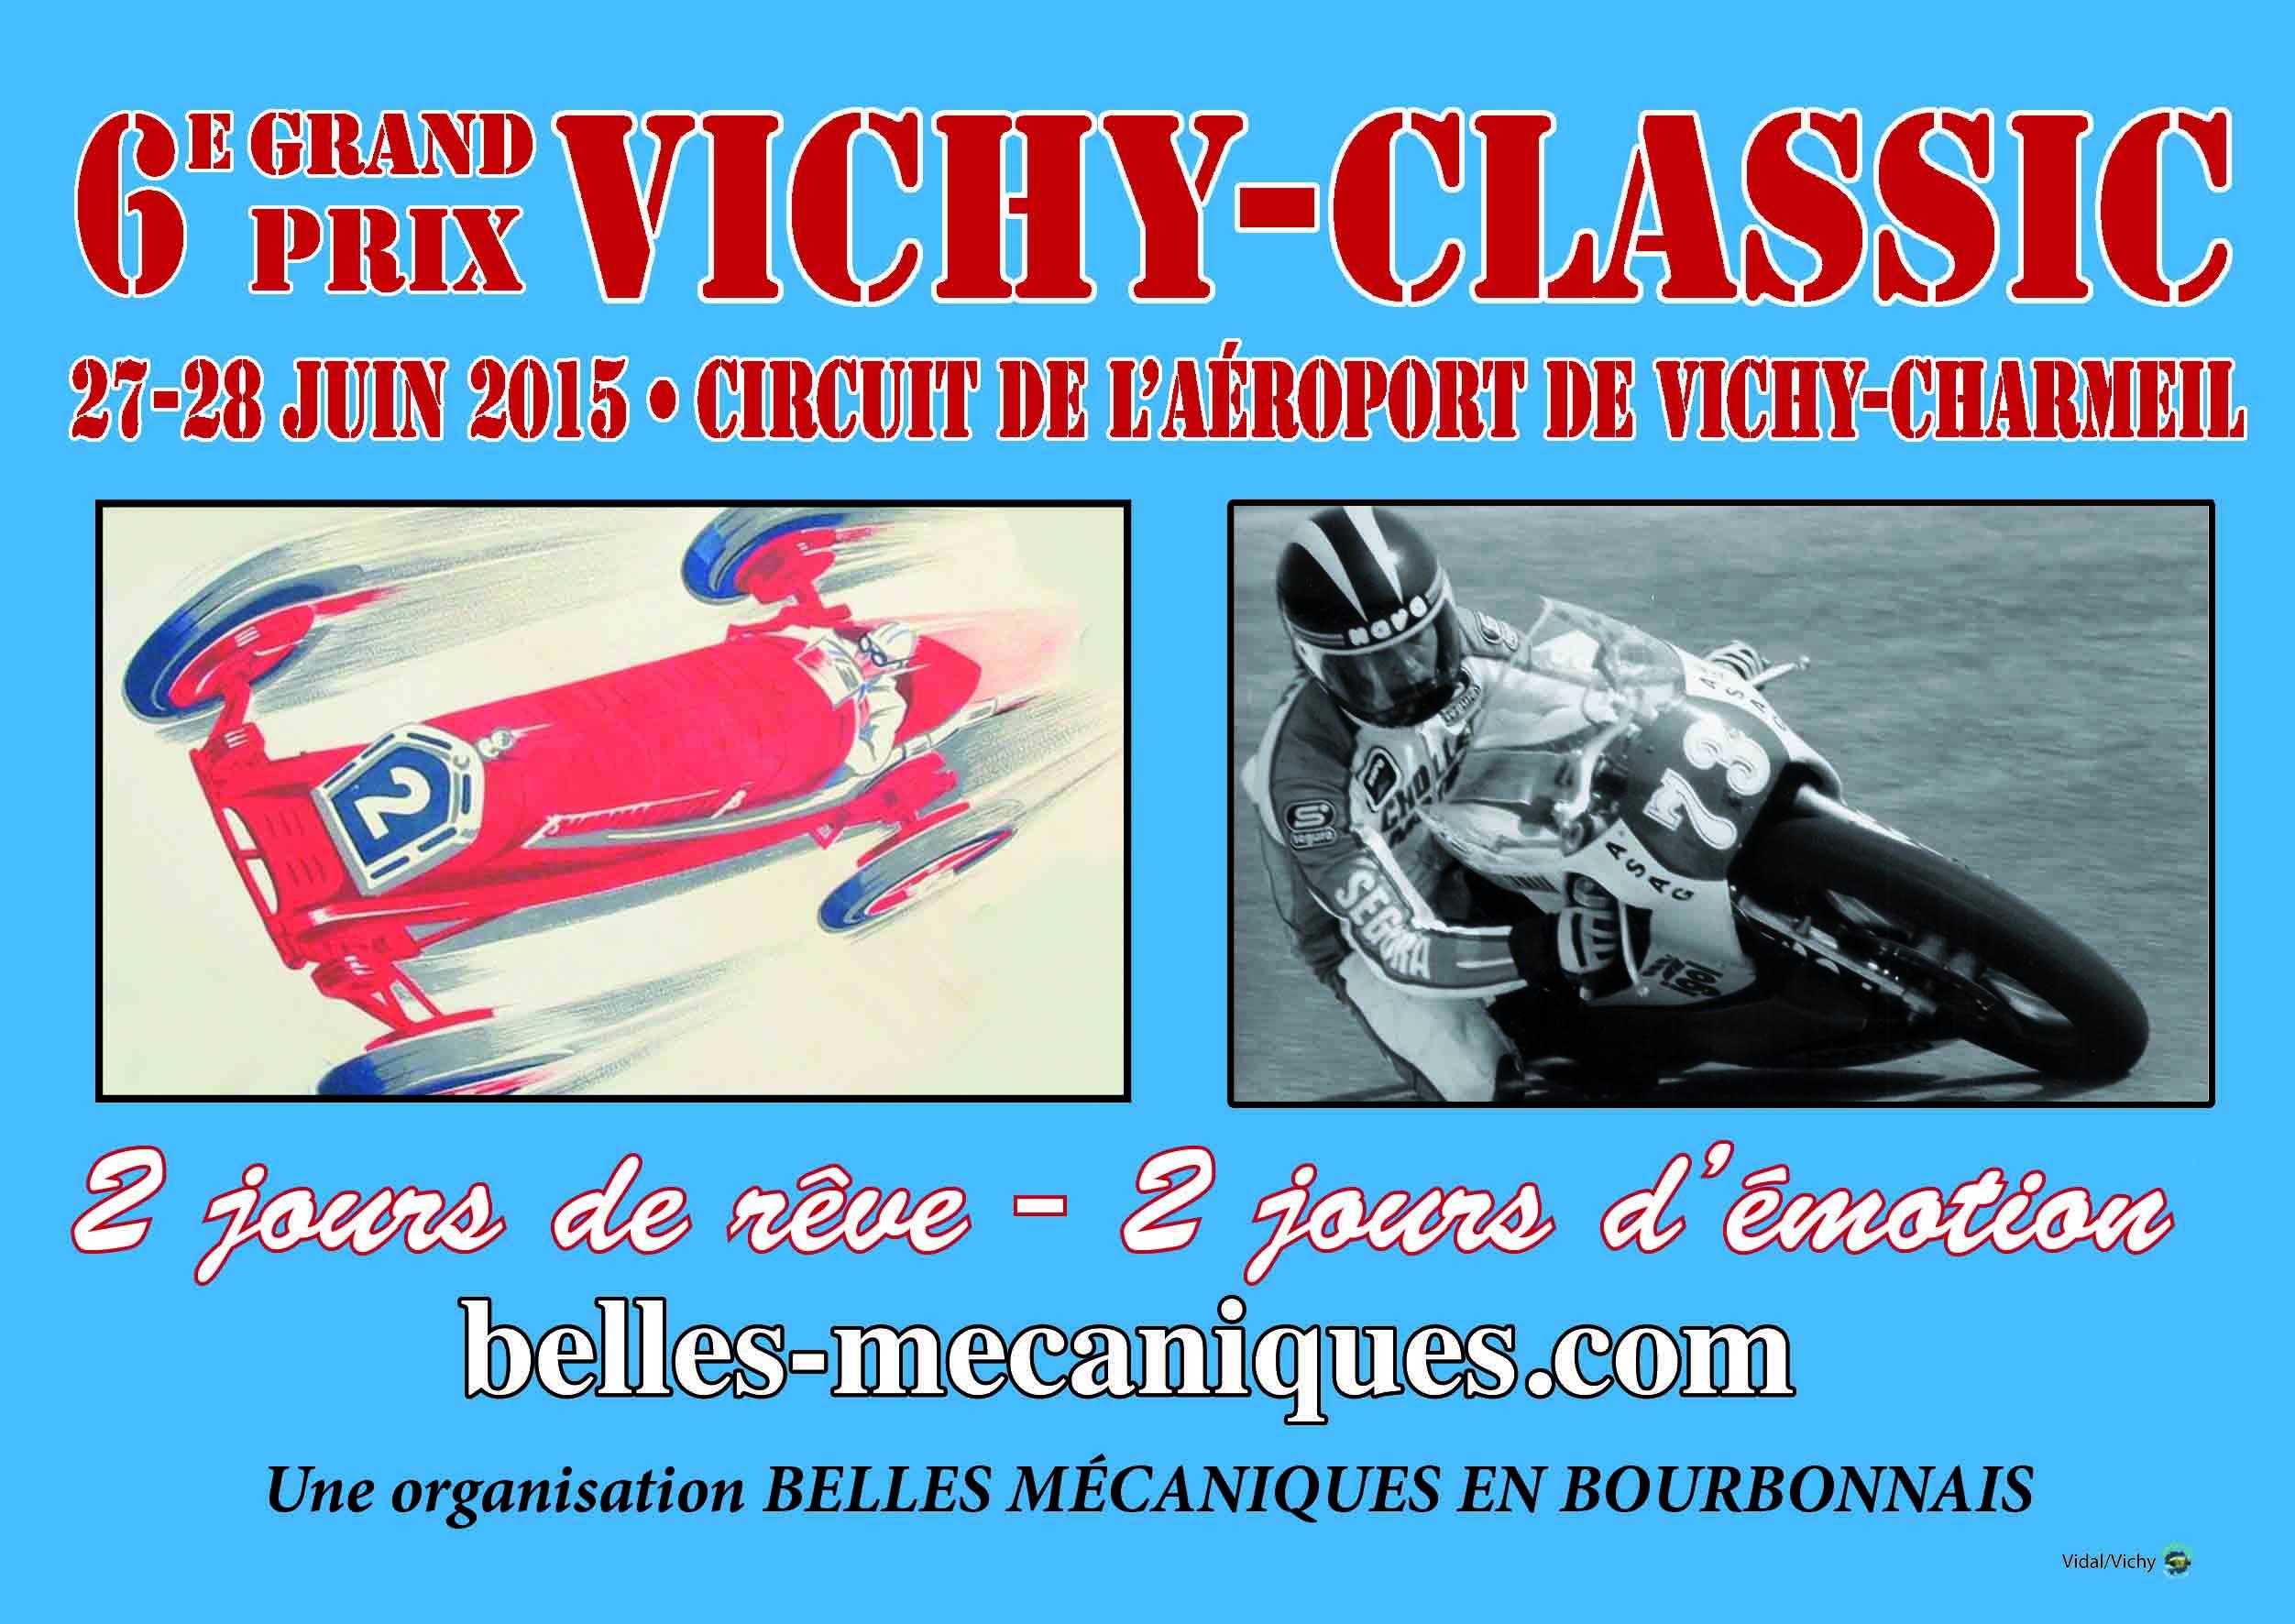 Vichy Classic 2015 Flyers_27-28_juin_2015_copie